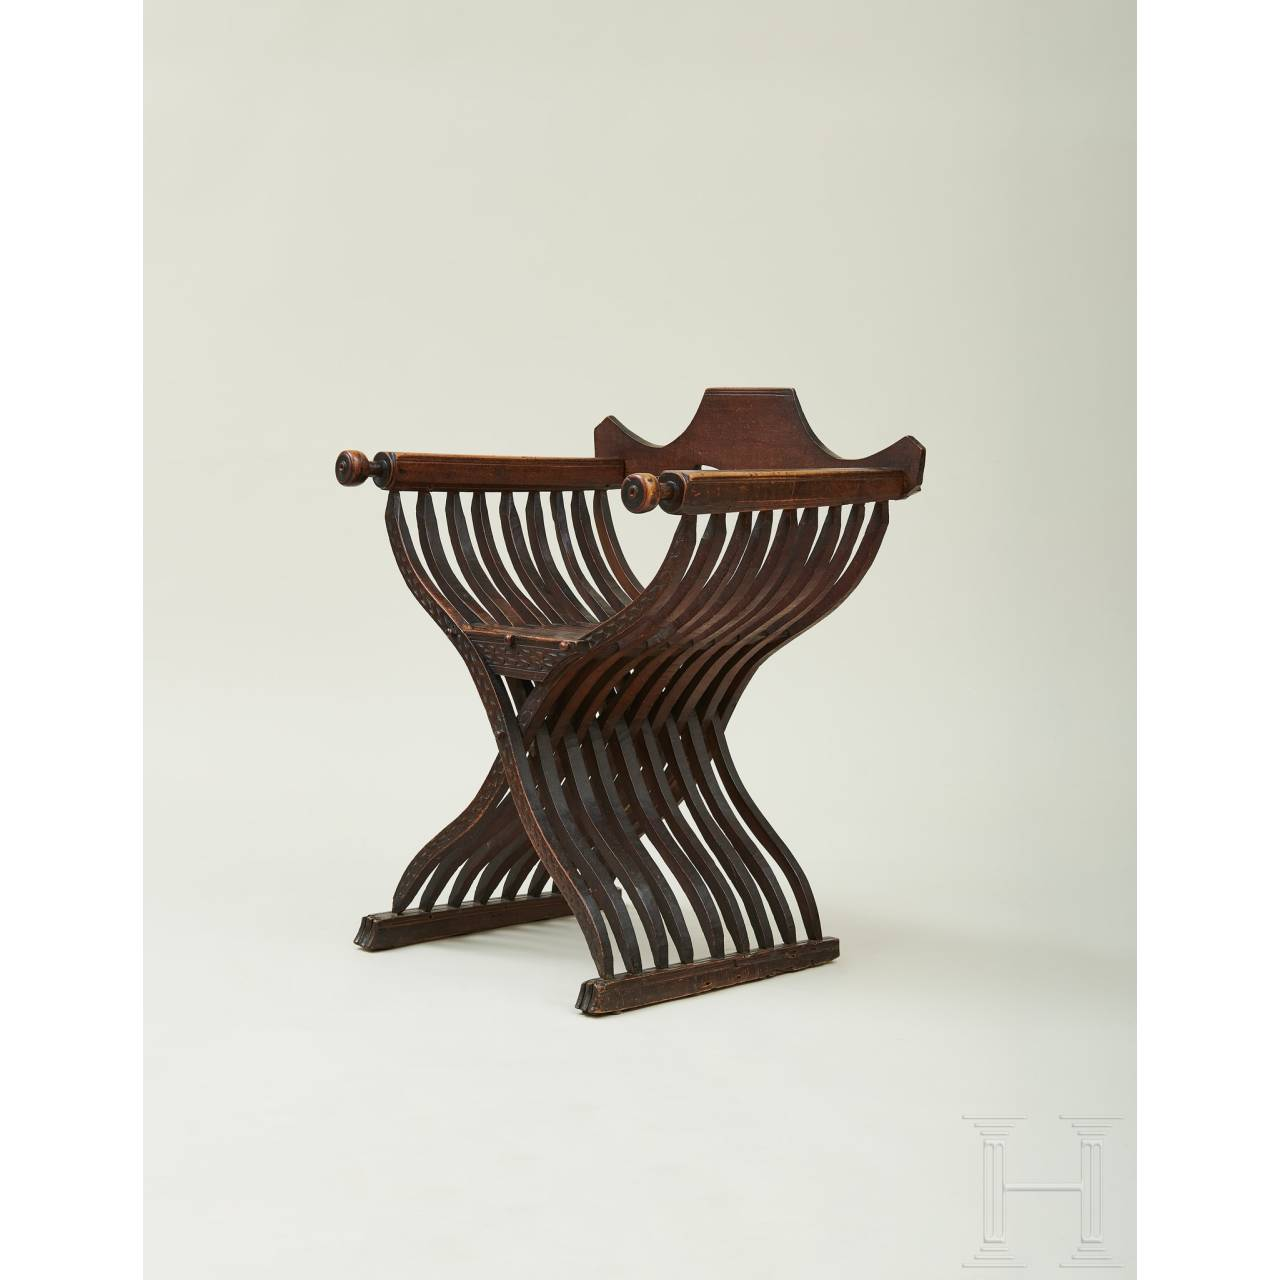 An Italian Renaissance folding chair, 16th century